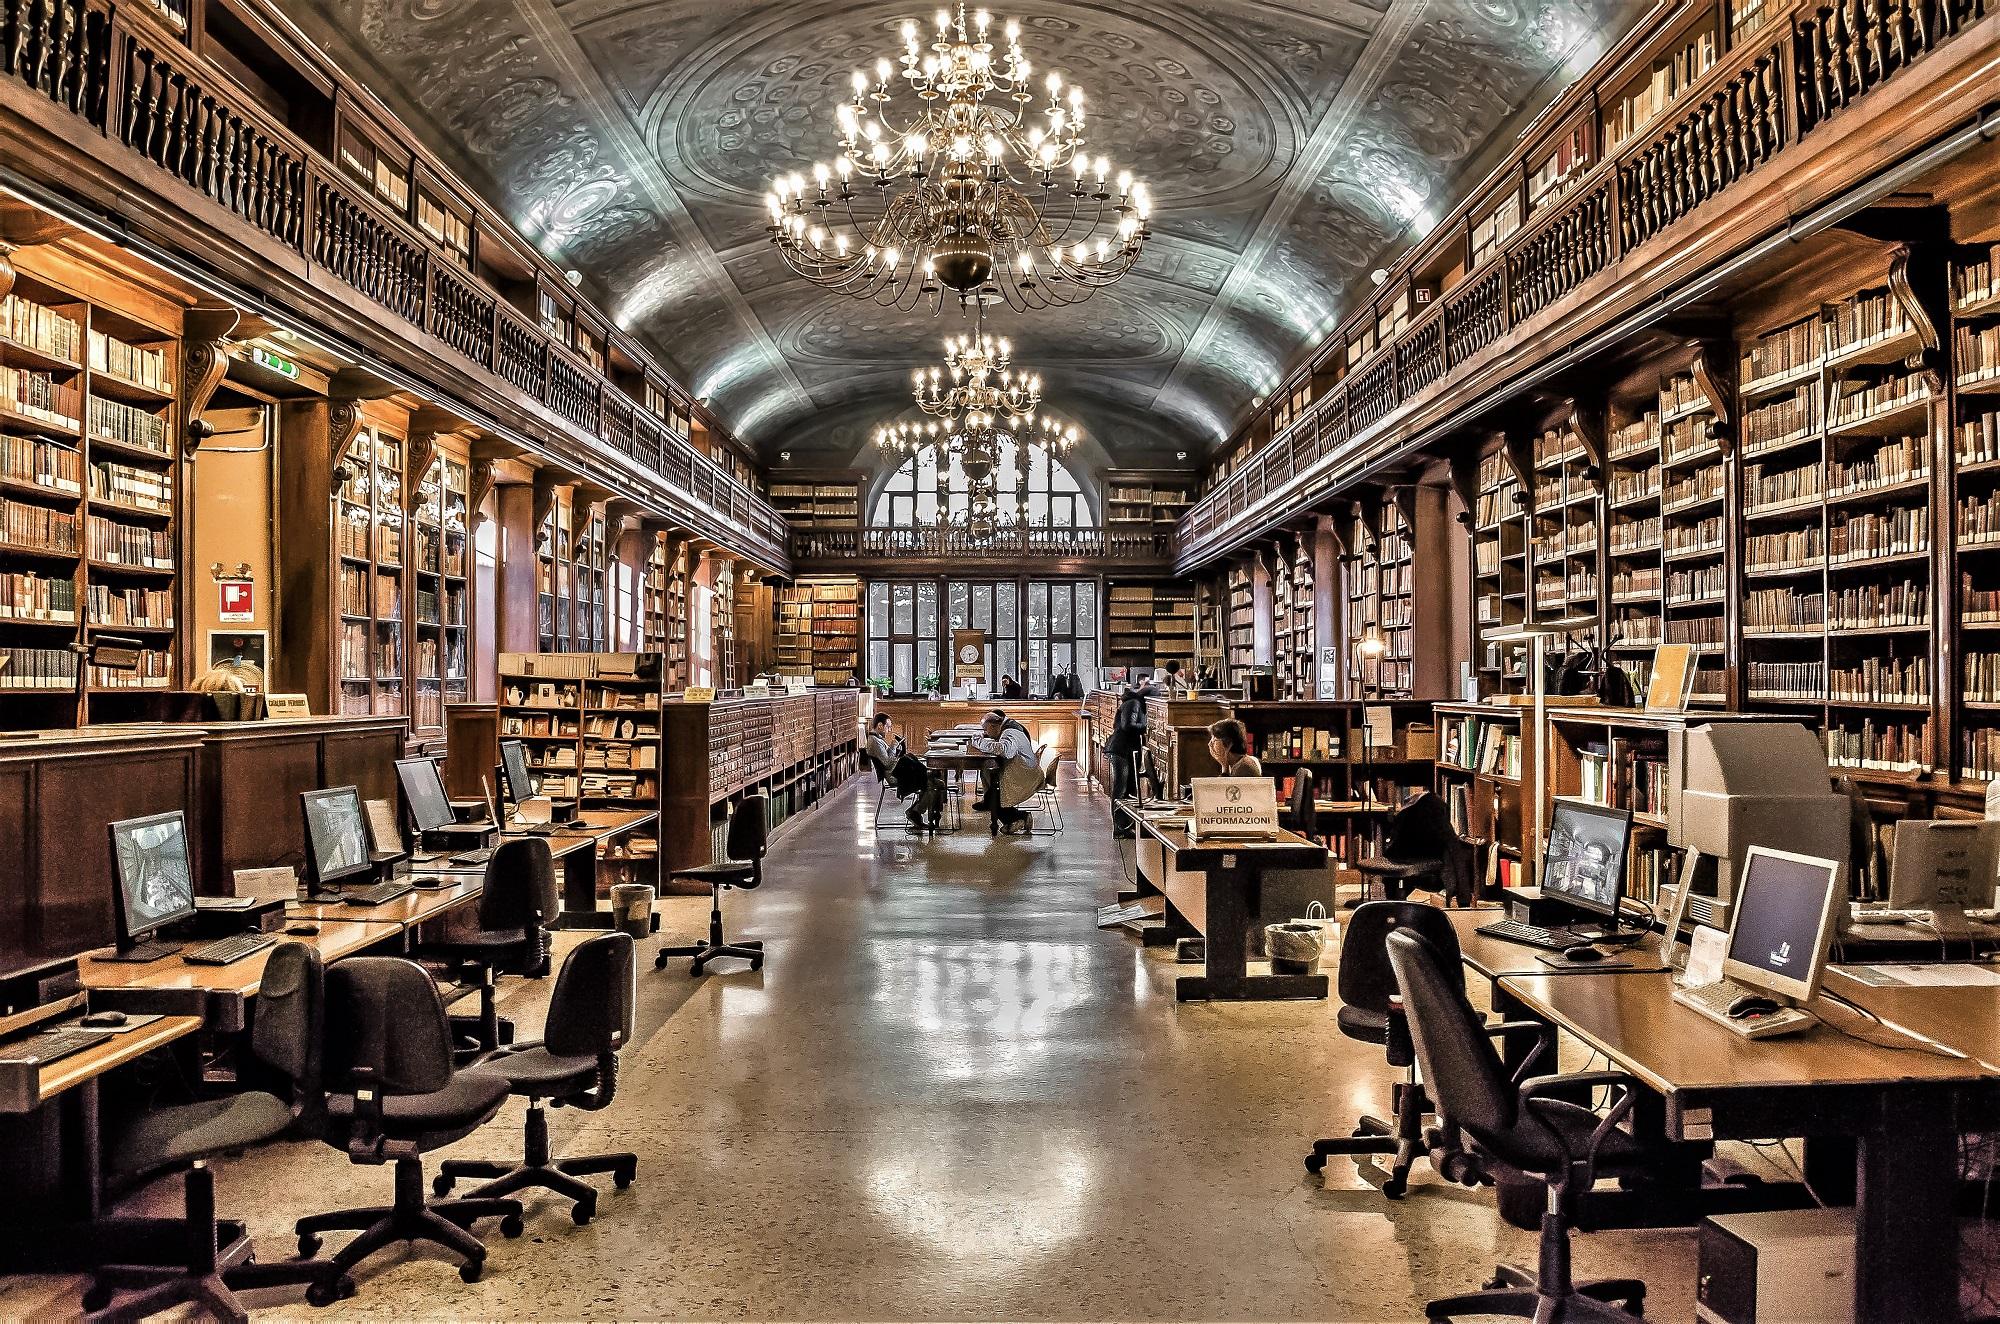 Brera Art Gallery - Braidense National Library ...